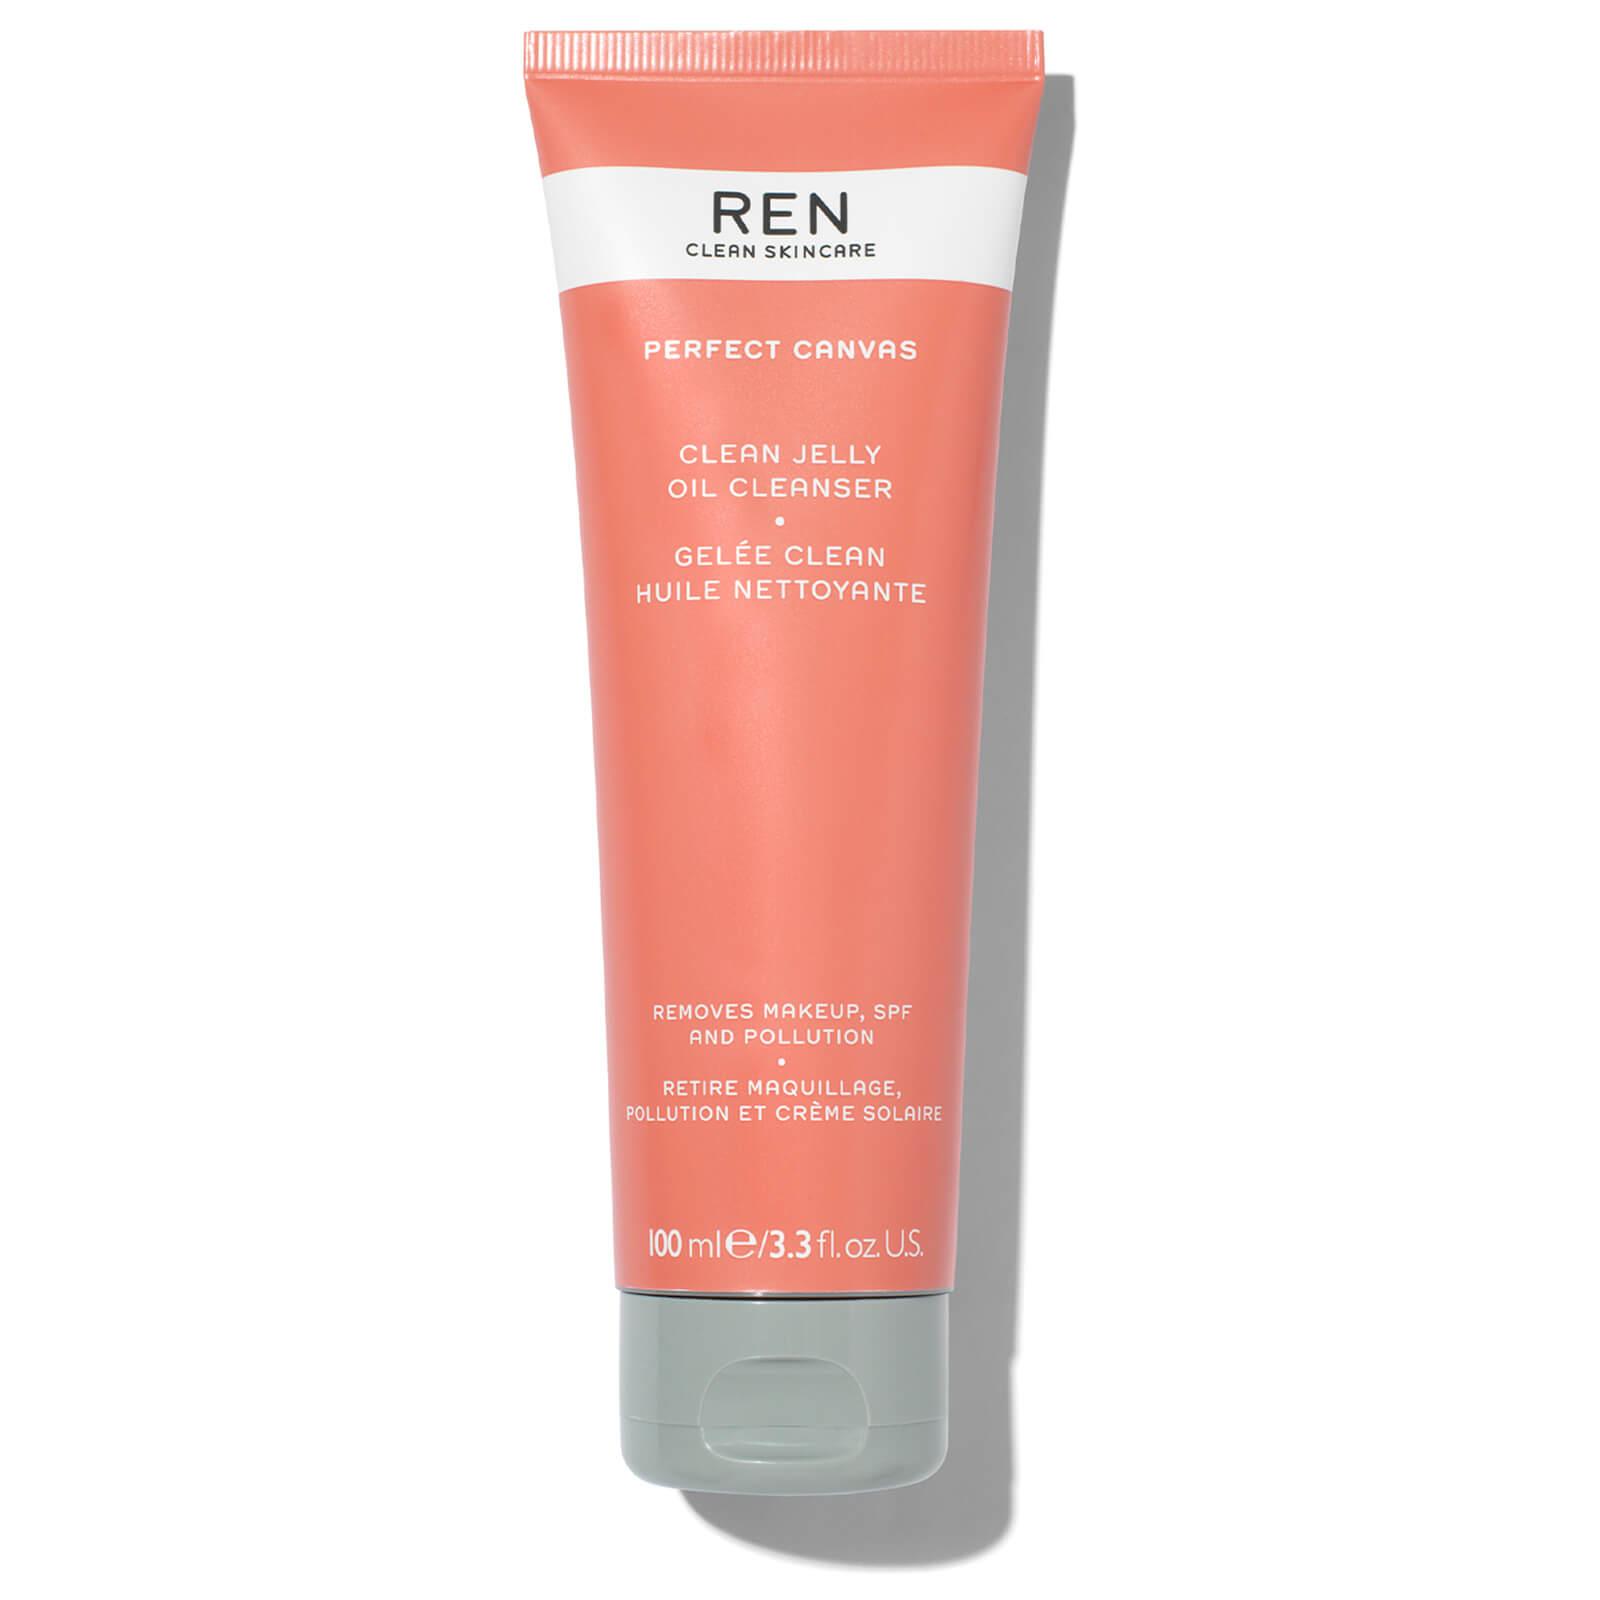 Купить REN Clean Skincare Perfect Canvas Clean Jelly Oil Cleanser 100ml